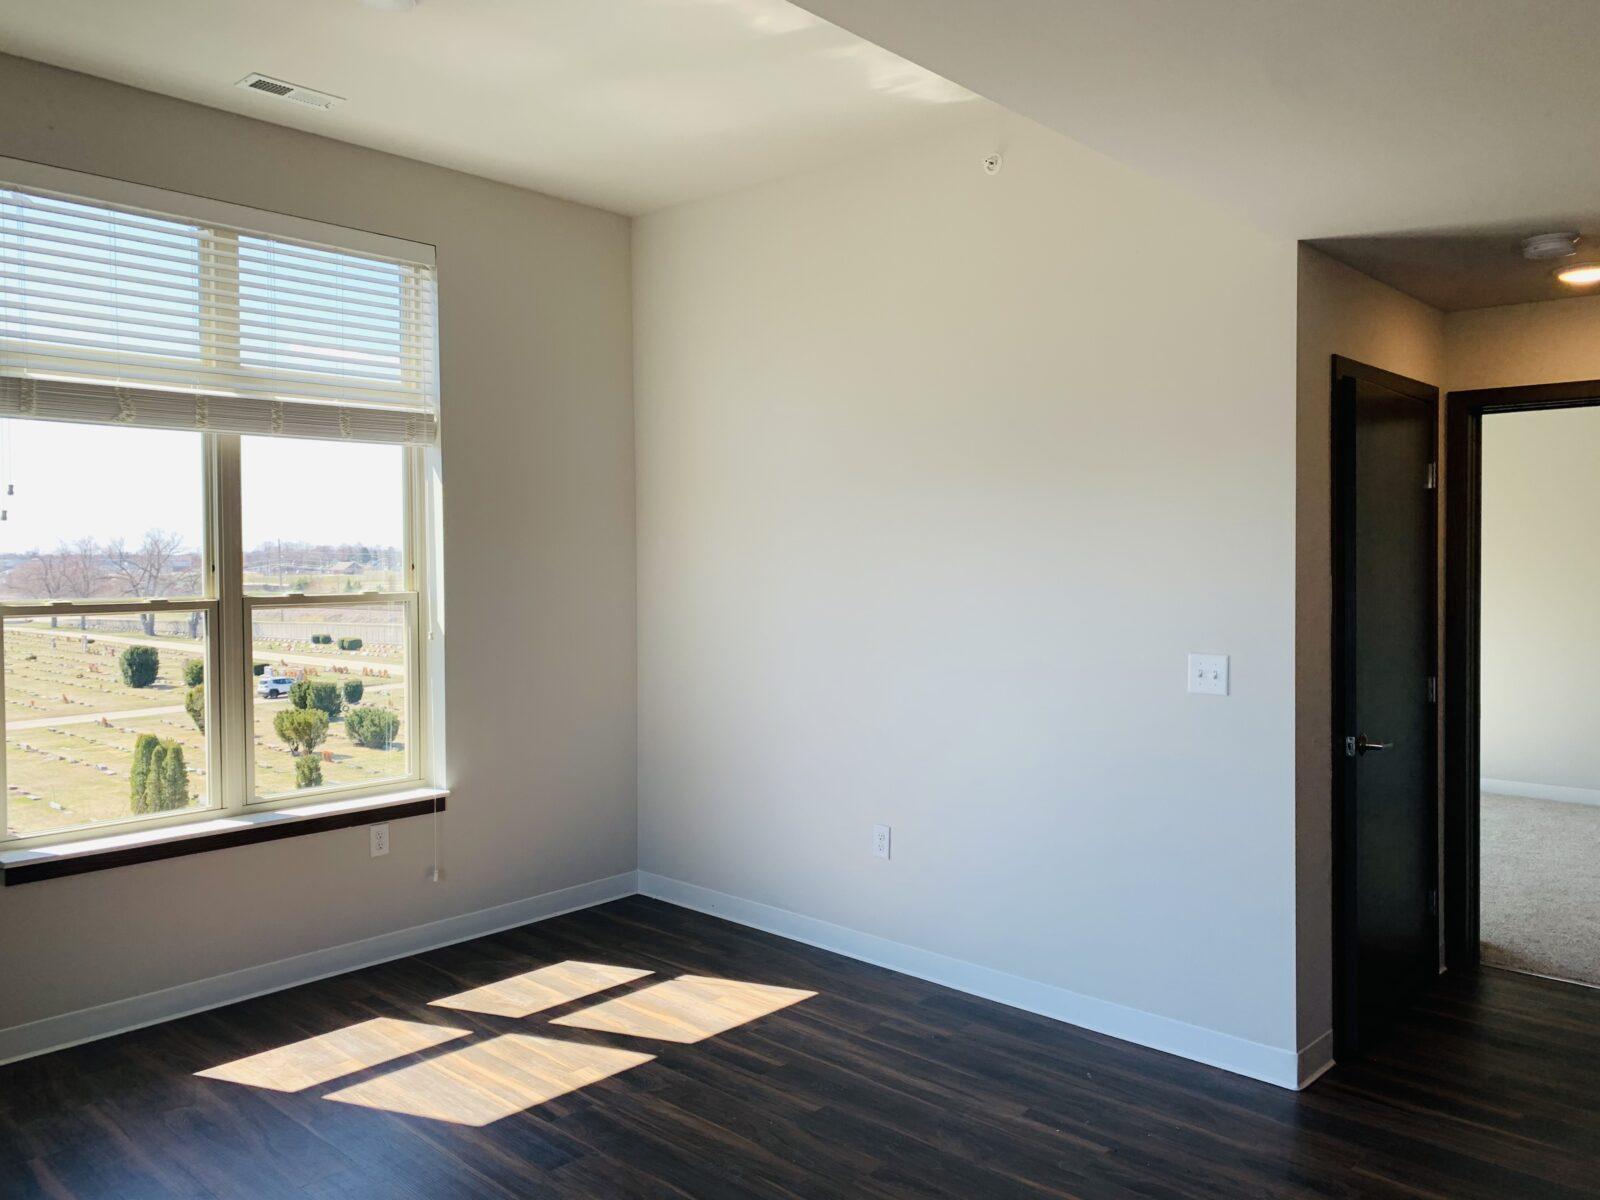 construction management associates, general contractors, Pike Ridge Apartments